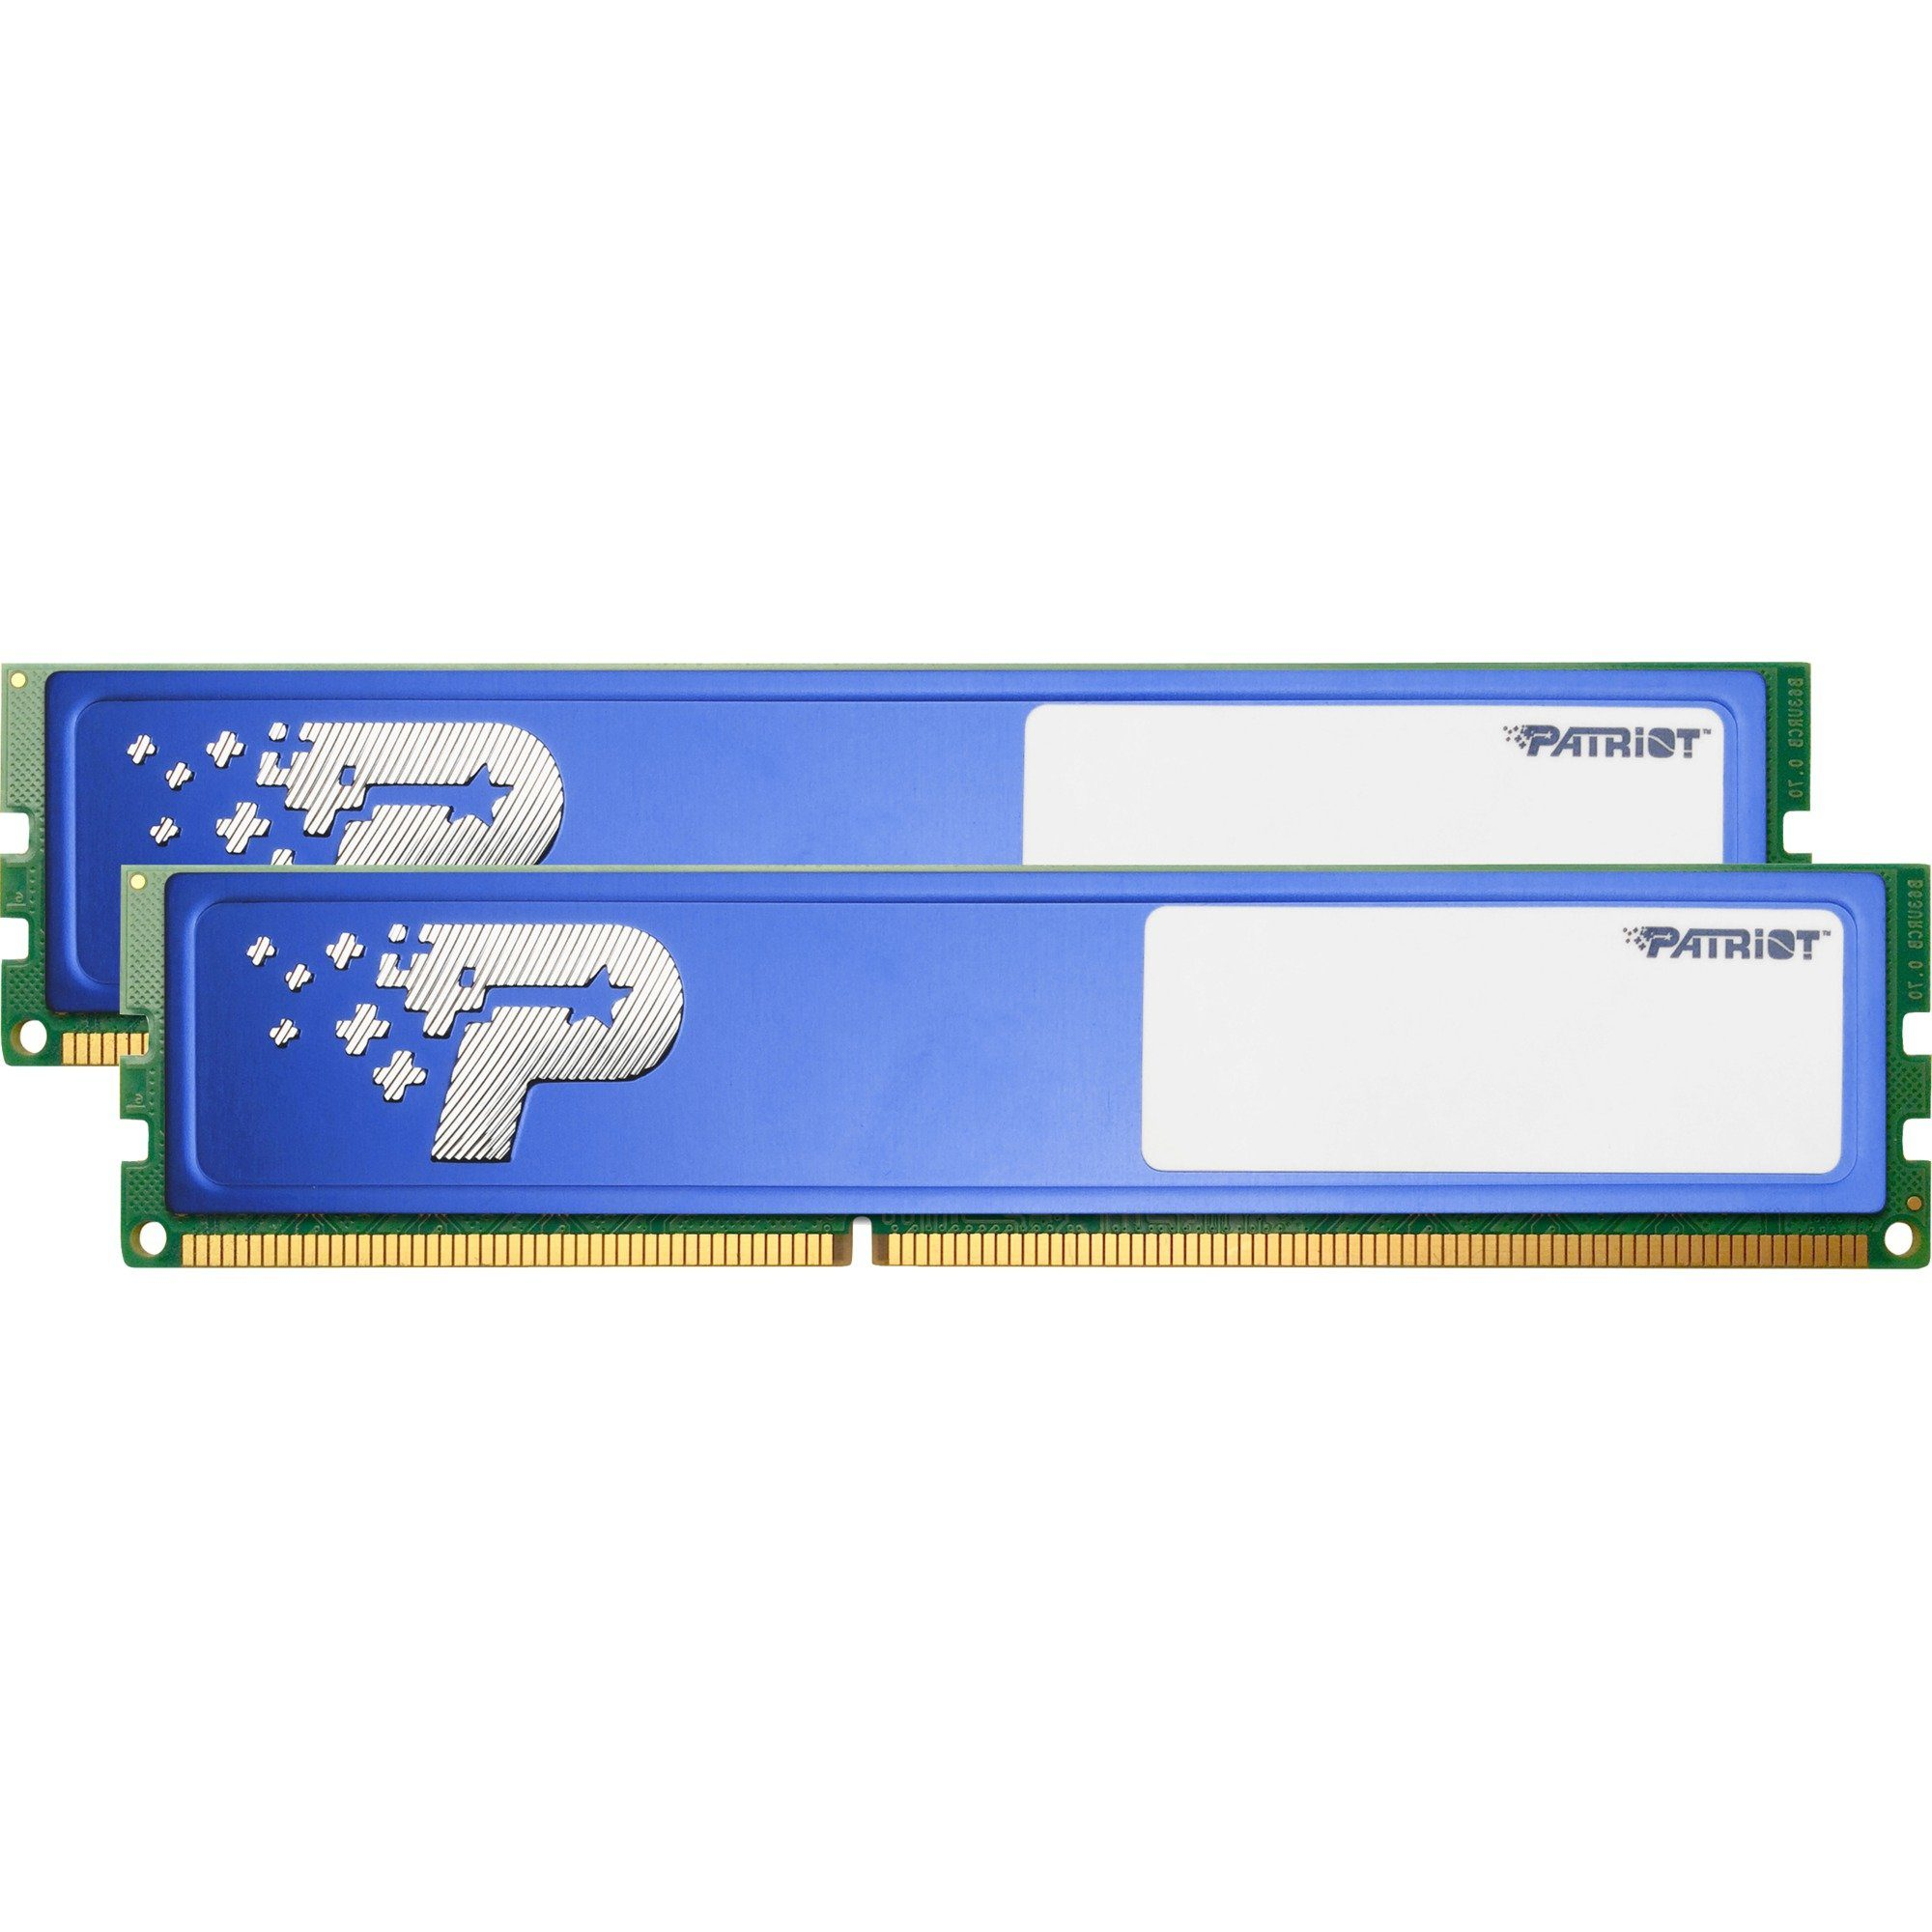 Patriot Arbeitsspeicher »DIMM 8 GB DDR4-2133 Kit, PSD48G2133K, Signature«